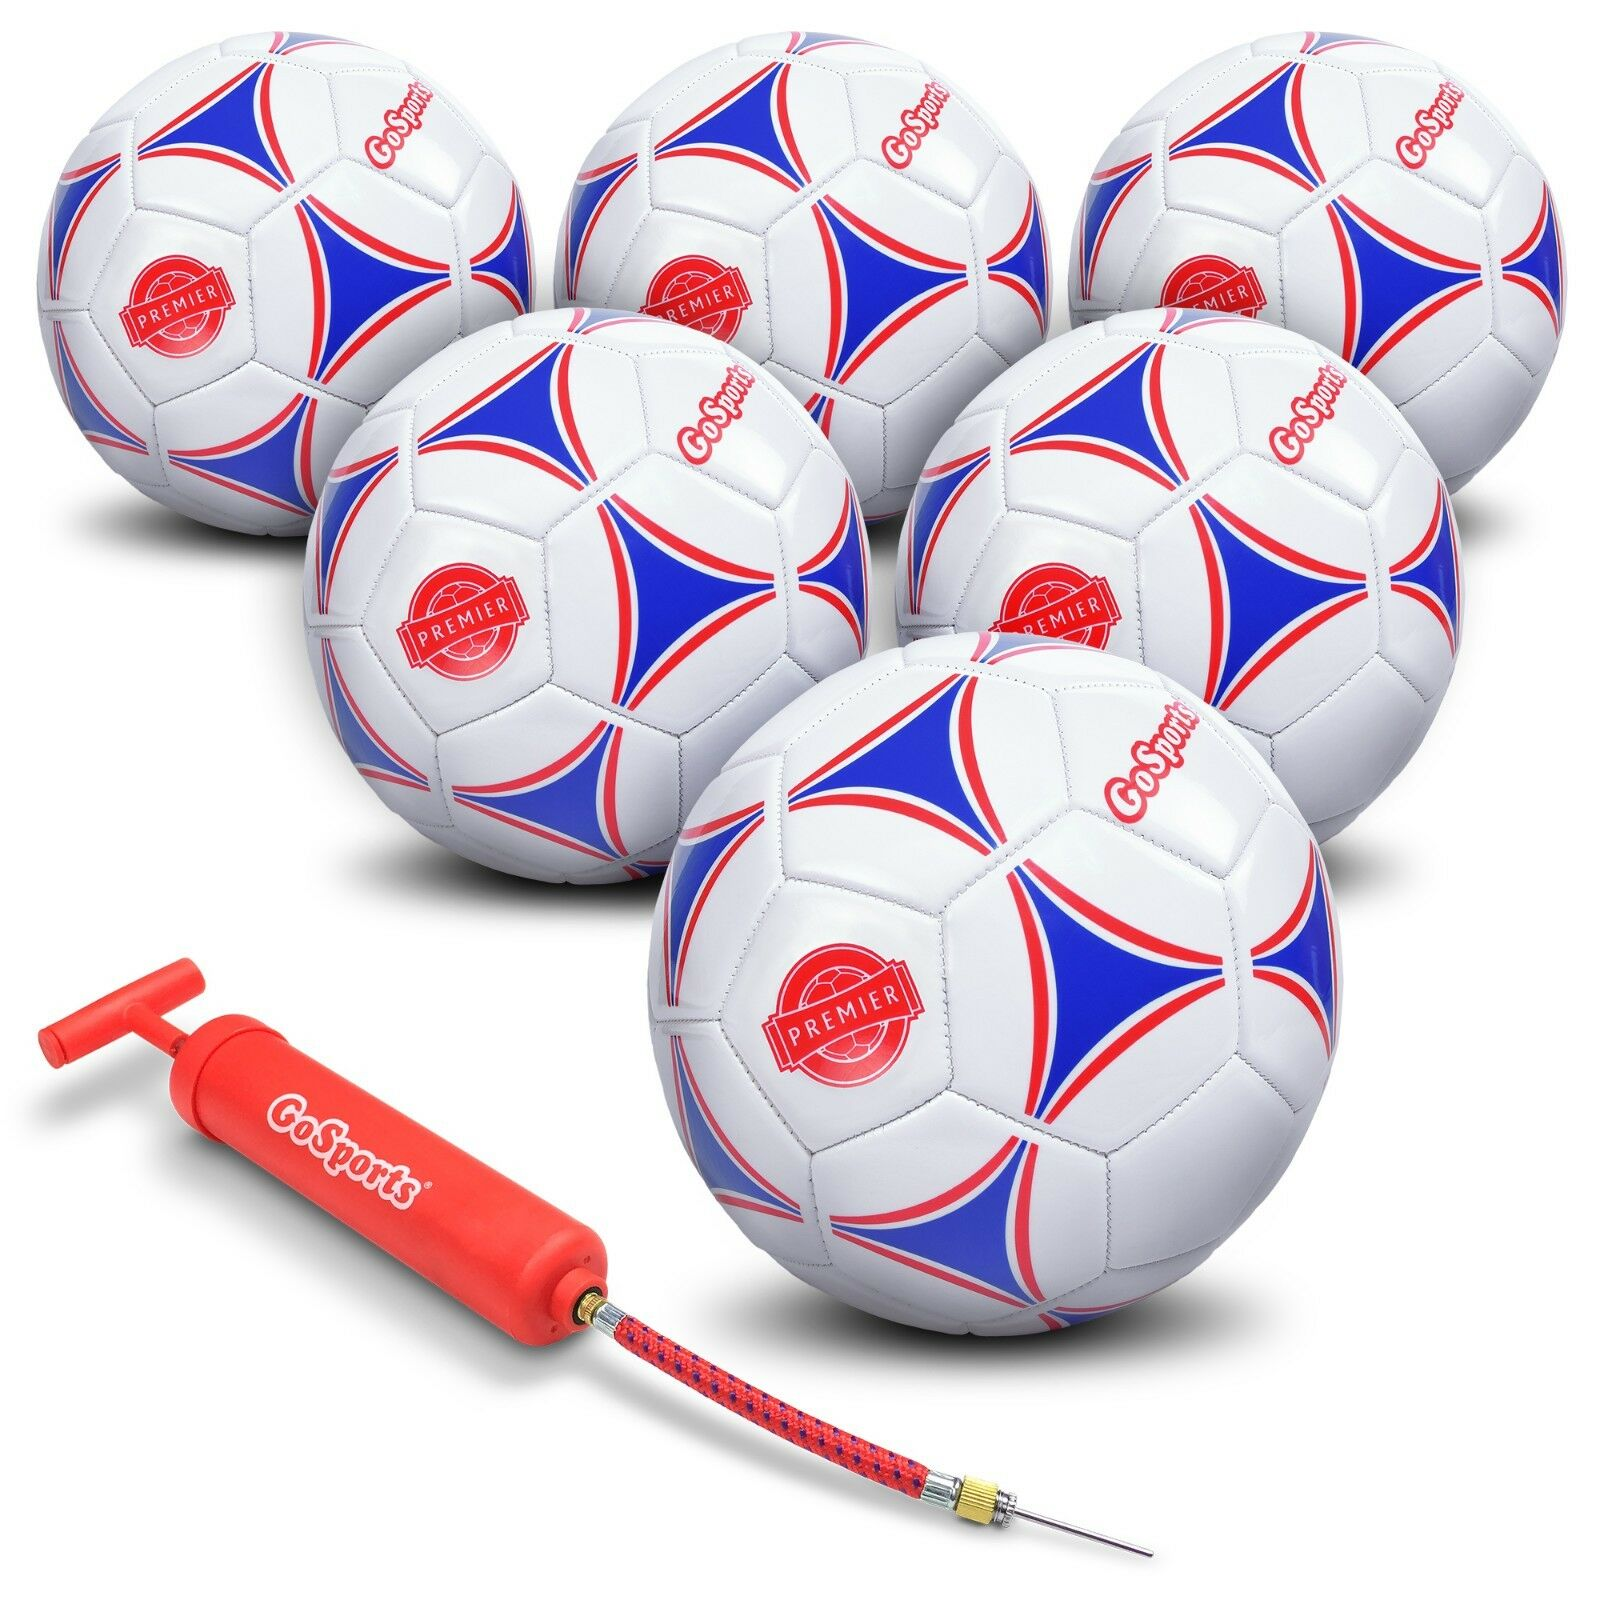 Gosports Premier pelota de fútbol con bomba Premium Premium Premium Pack 6, tamaño 5 495de7